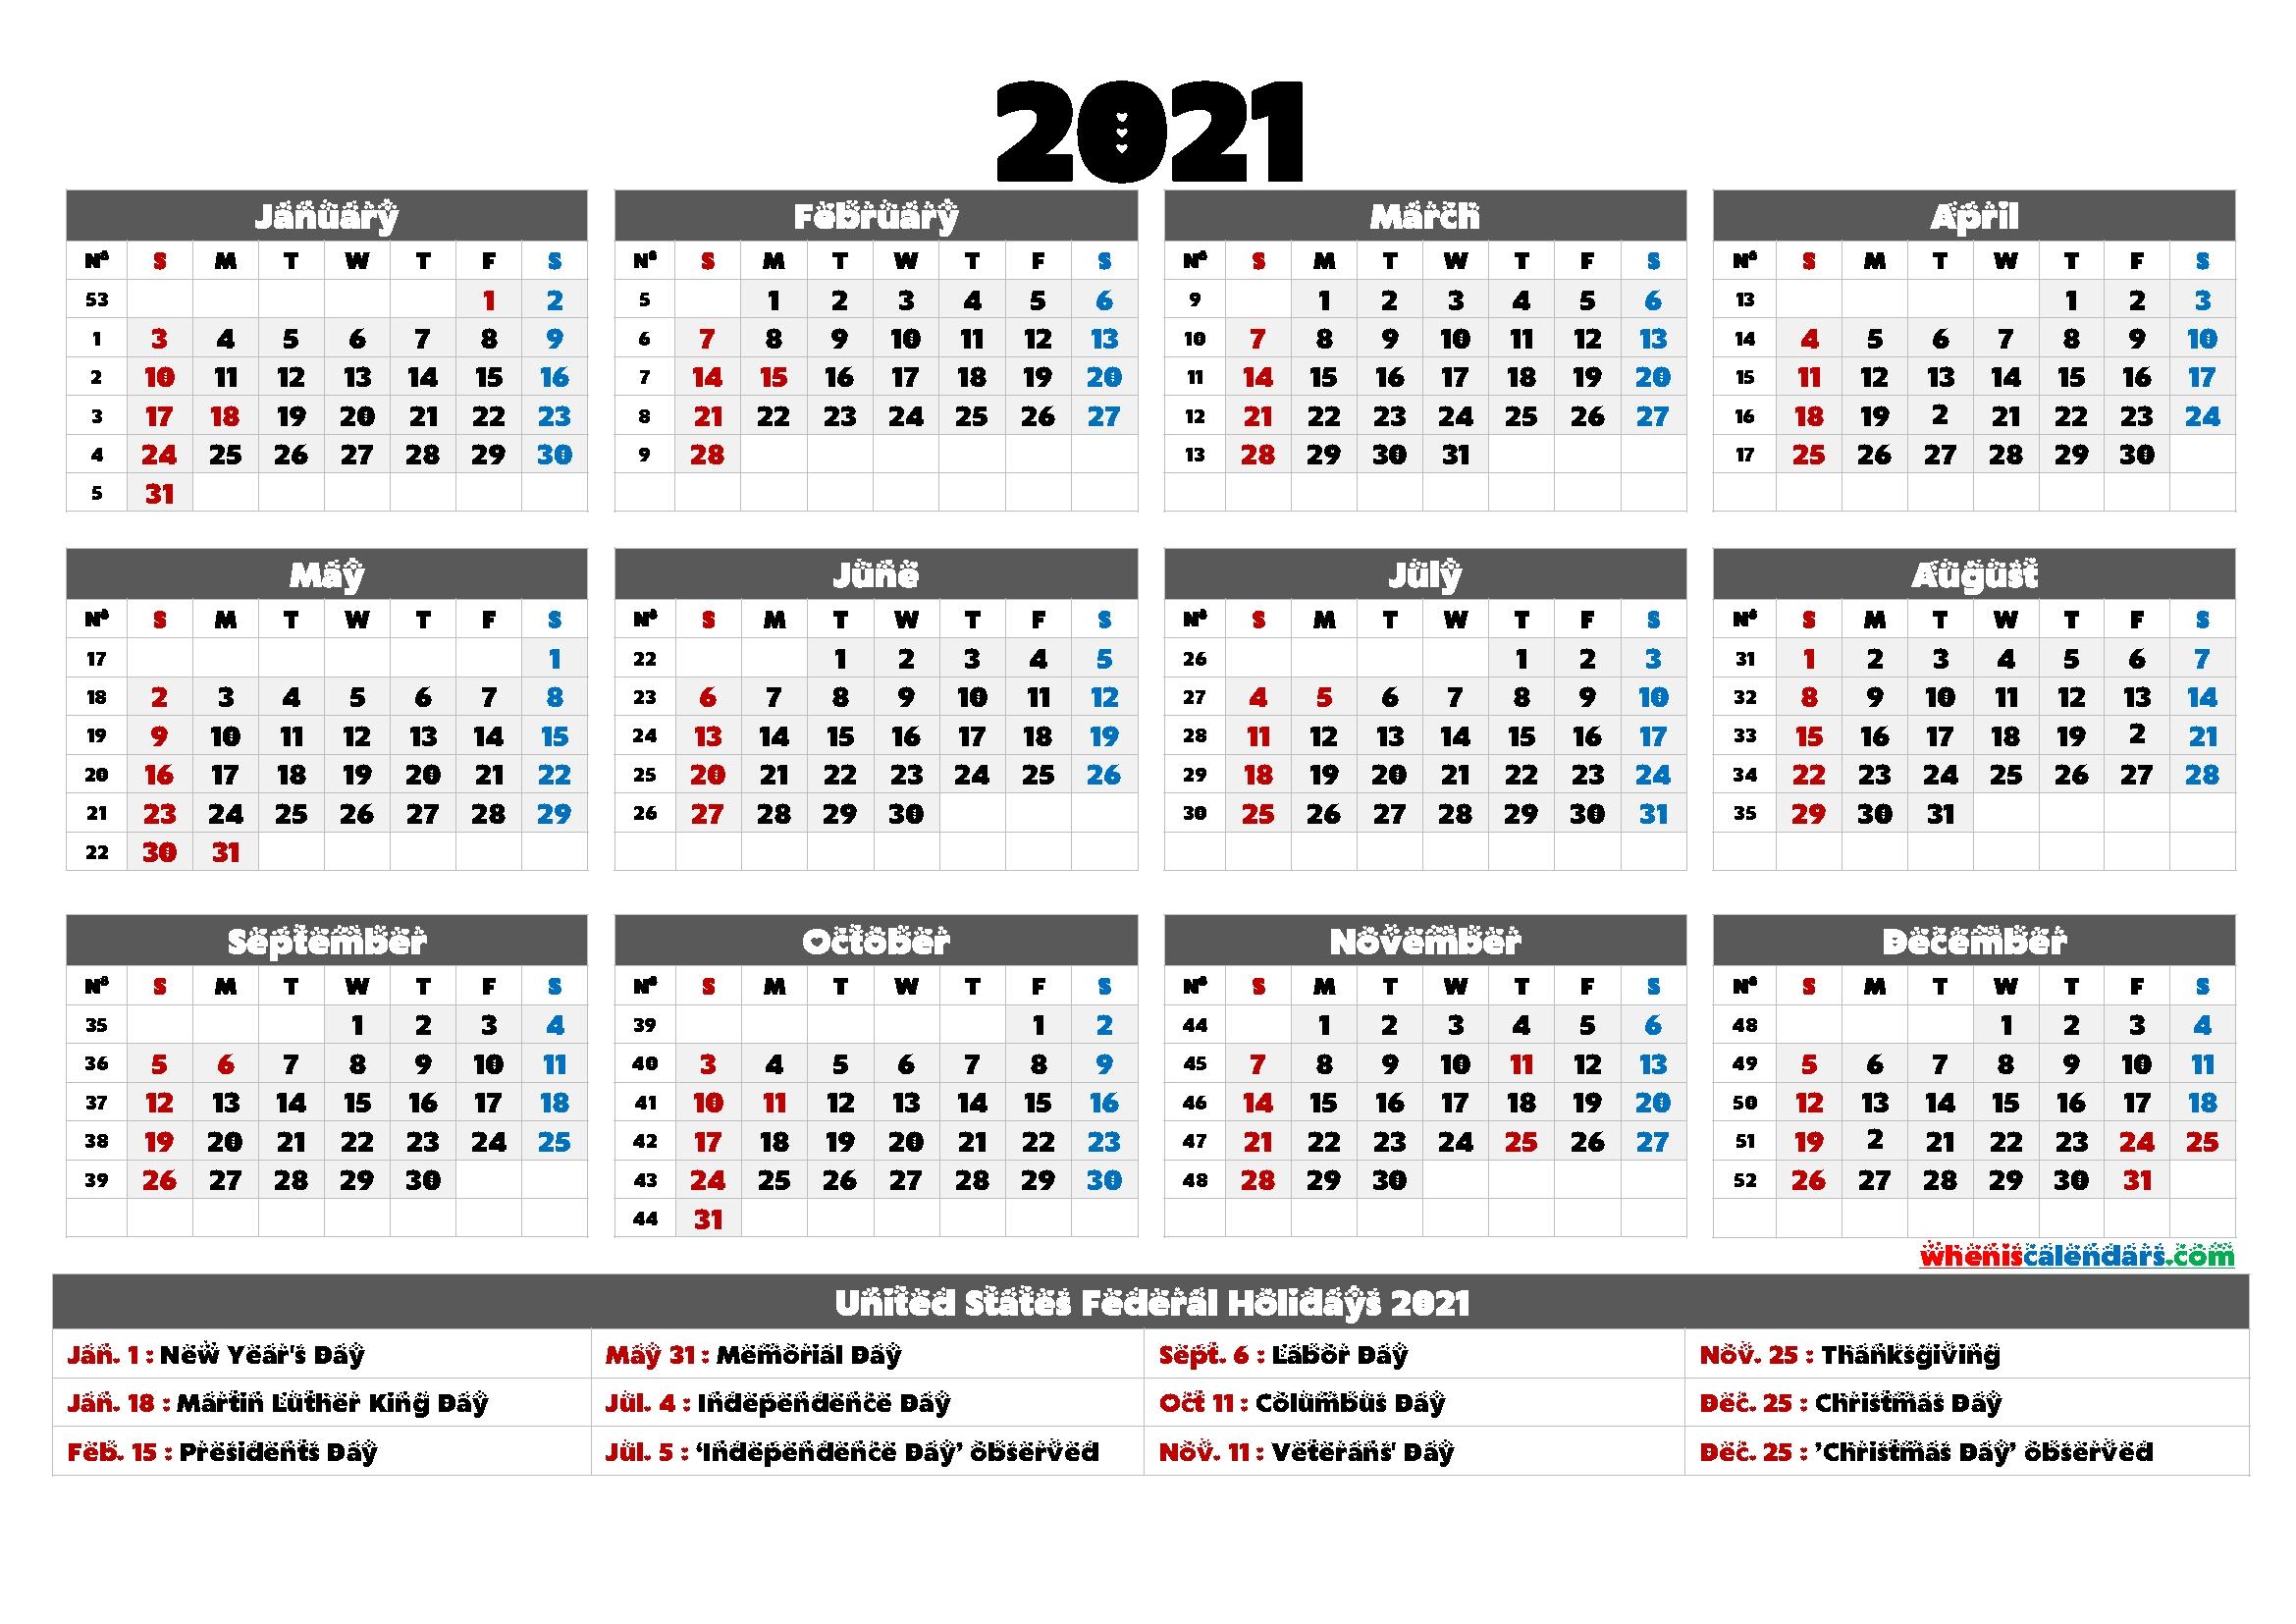 2021 Calendar With Holidays Printable - 6 Templates | Free Printable 2020 Calendar With Holidays for Illustrator 2021 Calendar Template